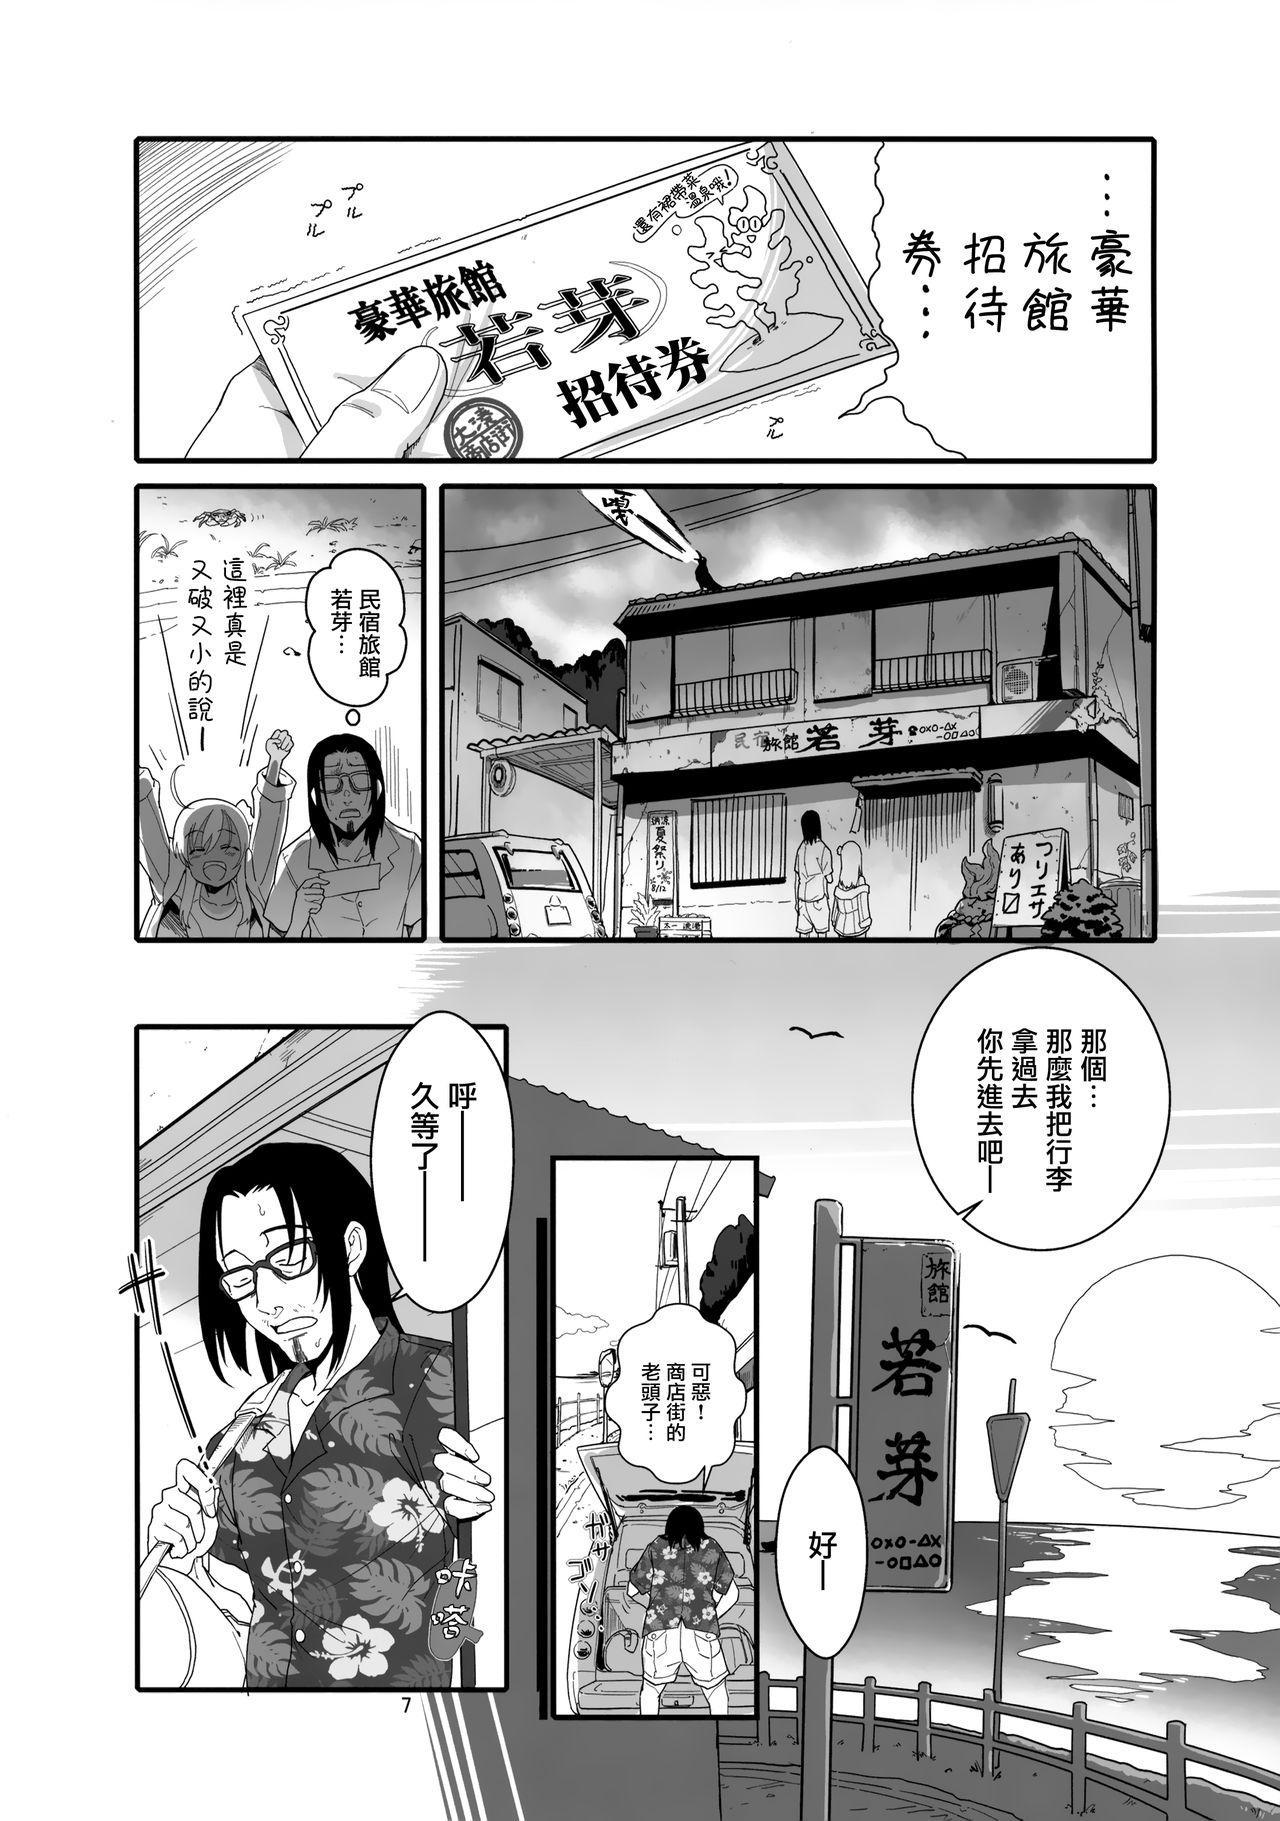 Ro-chan no Natsu no Resort de Suiminkan 6